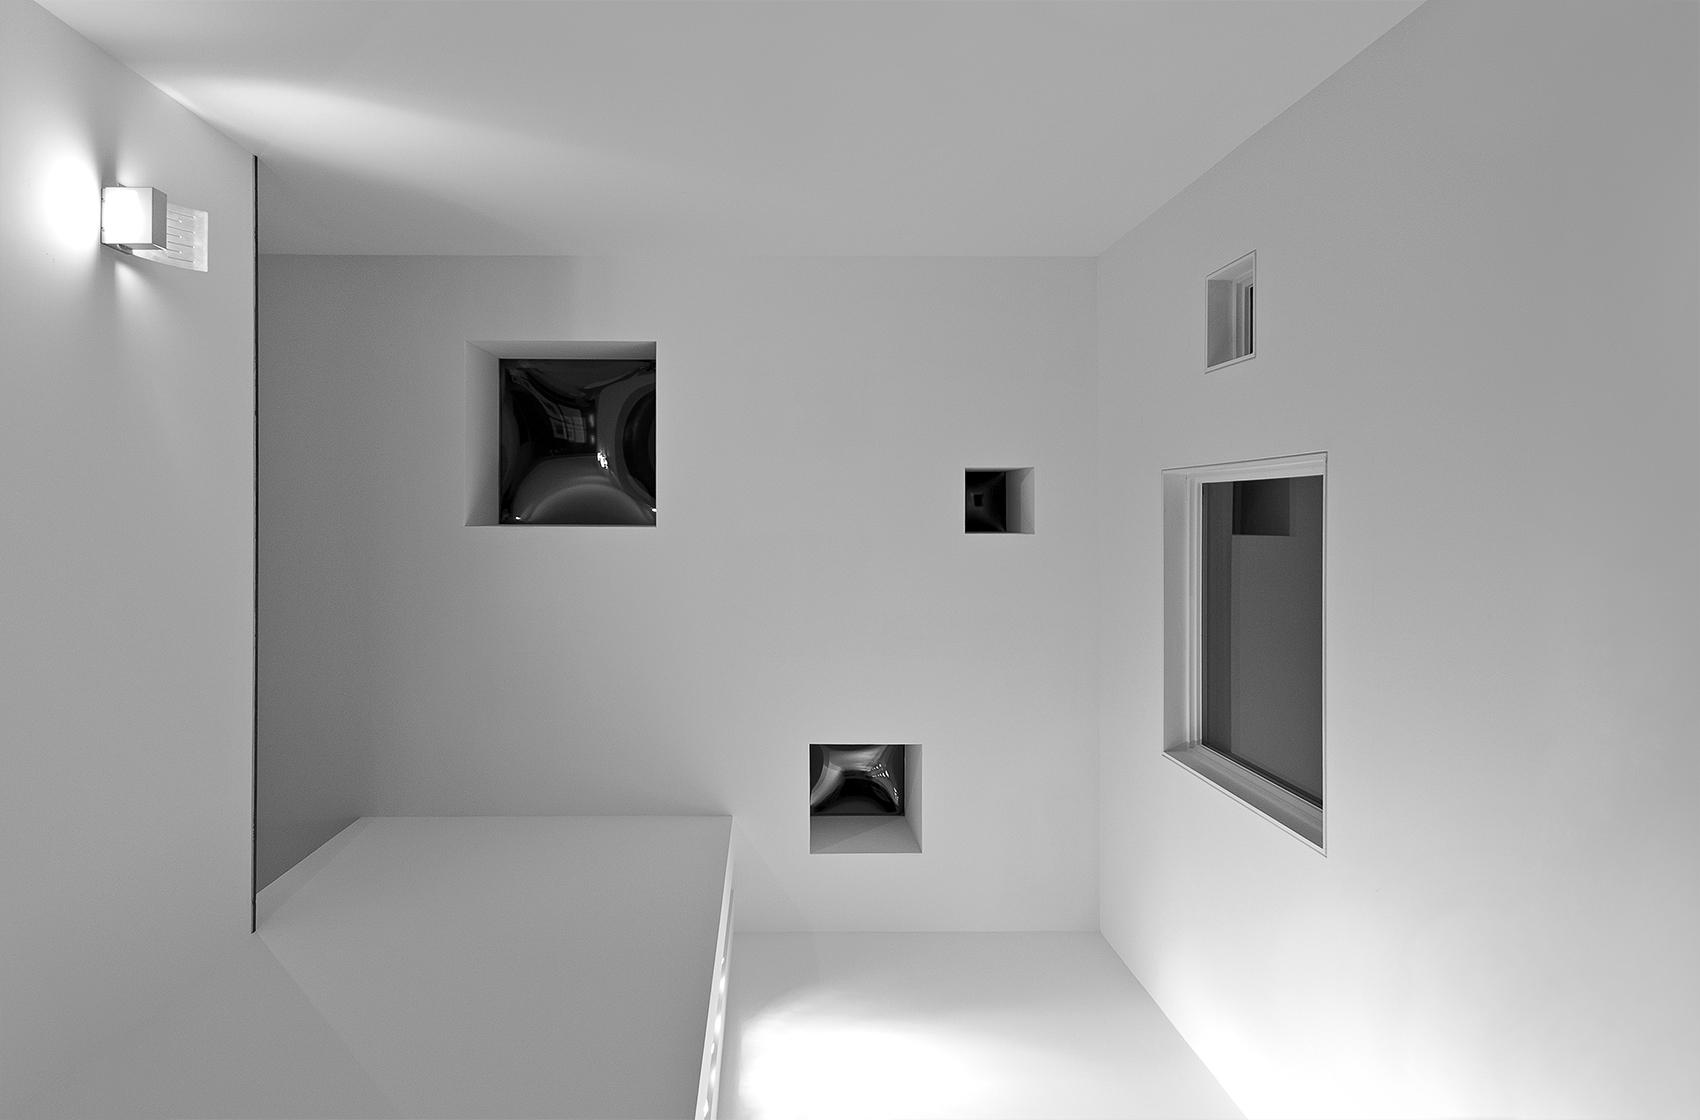 charcoal-image-09_edits2.jpg